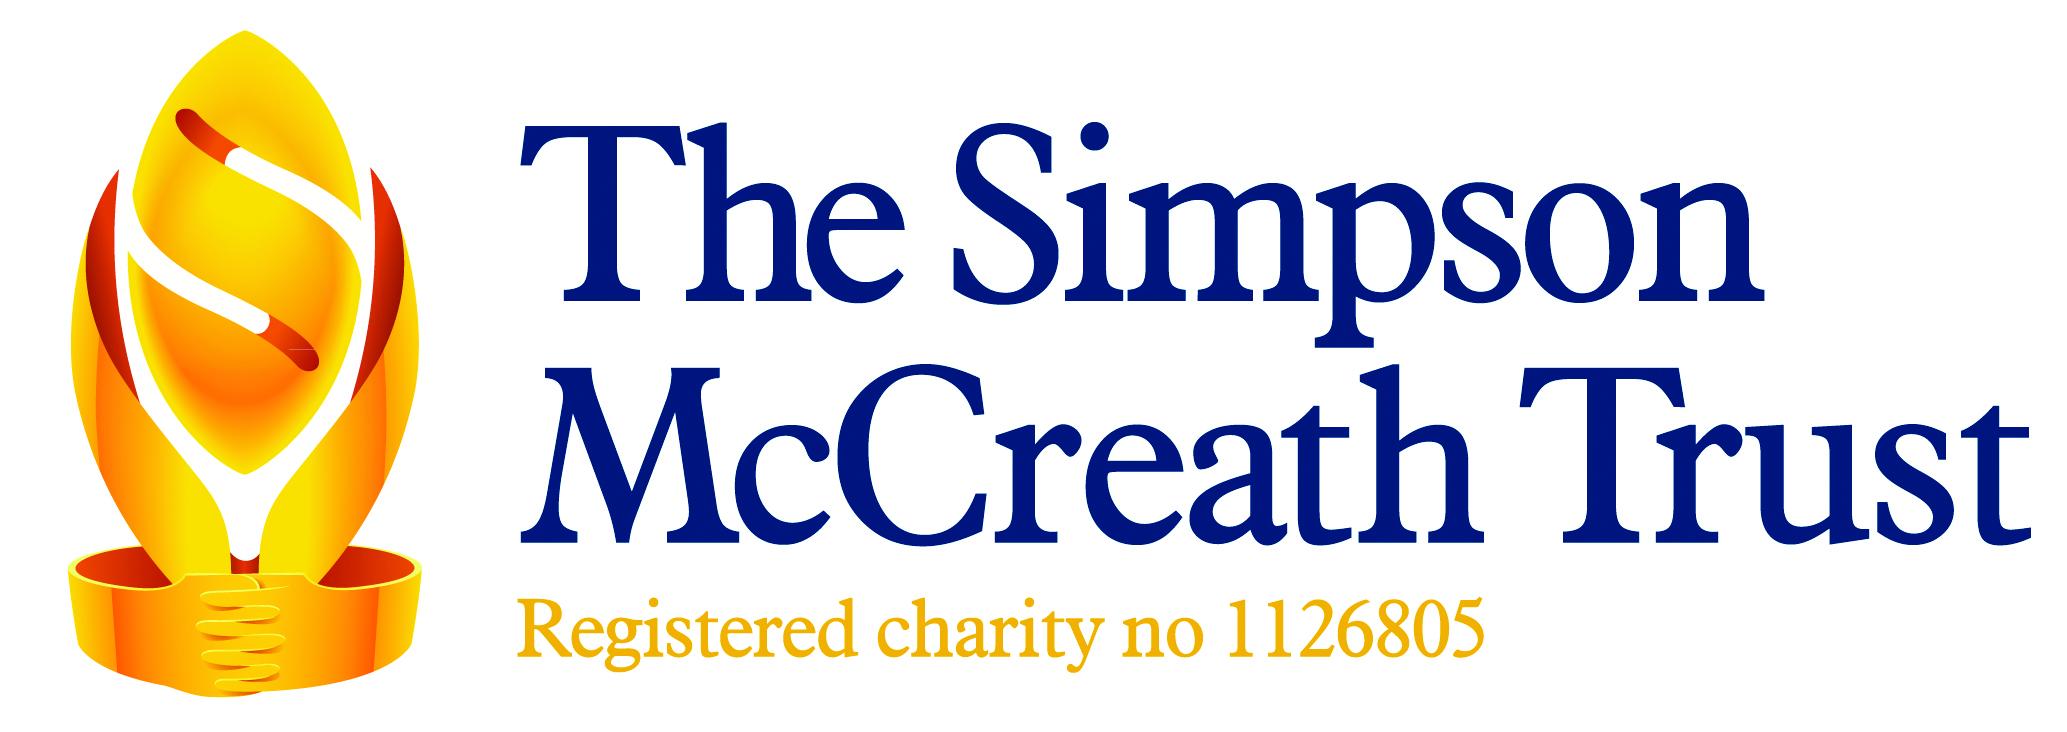 The Simpson McCreath Trust